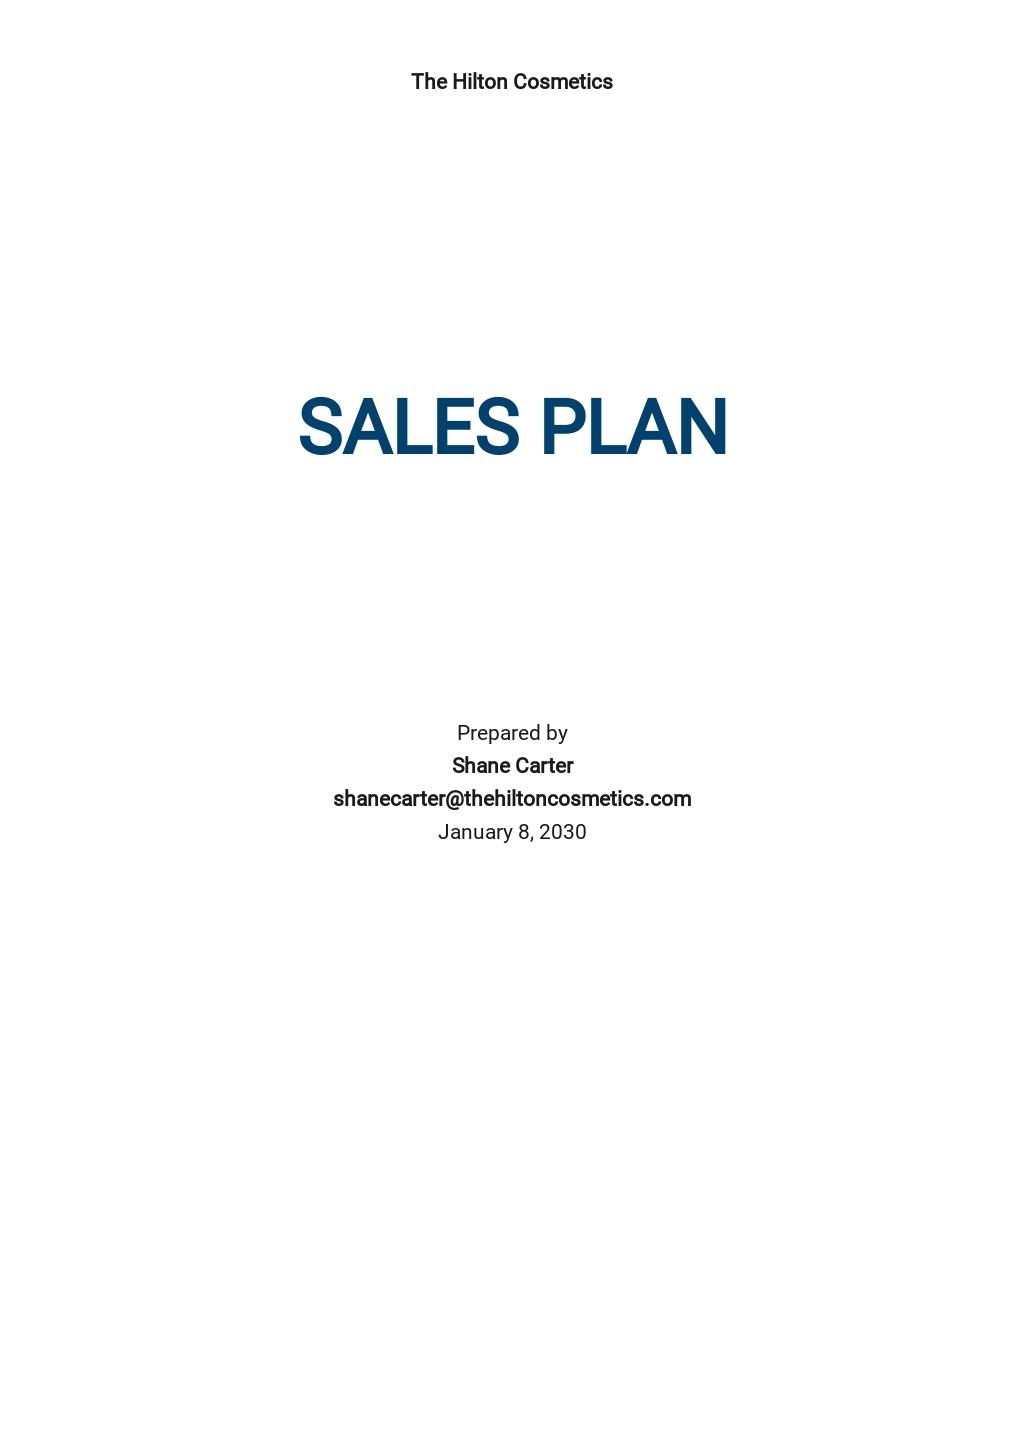 Generic Sales Plan Template